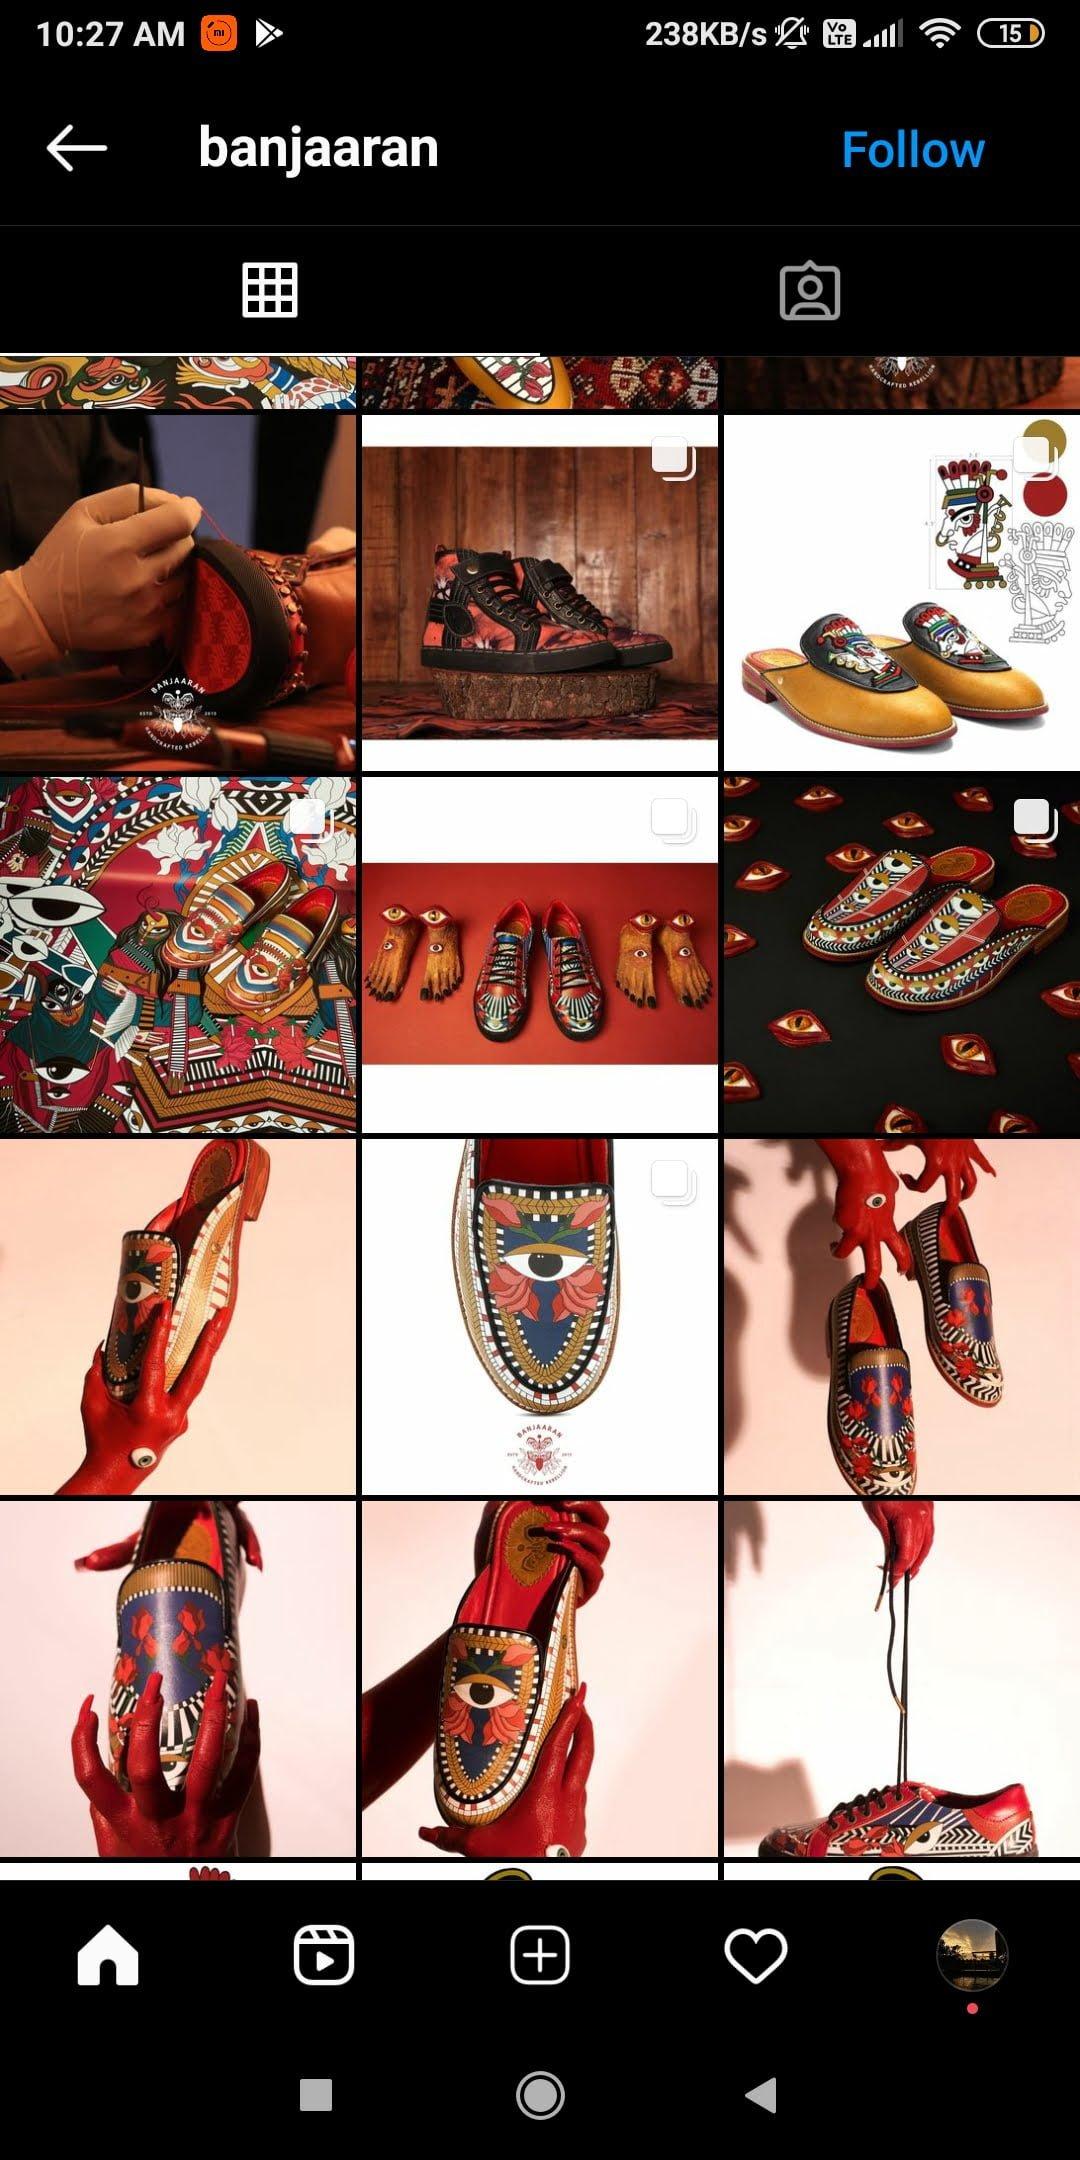 @banjaara  -  banjaaran - 50+ SHOPPING Instagram ACCOUNTS for Clothes, Shoes, Jewellery 2021